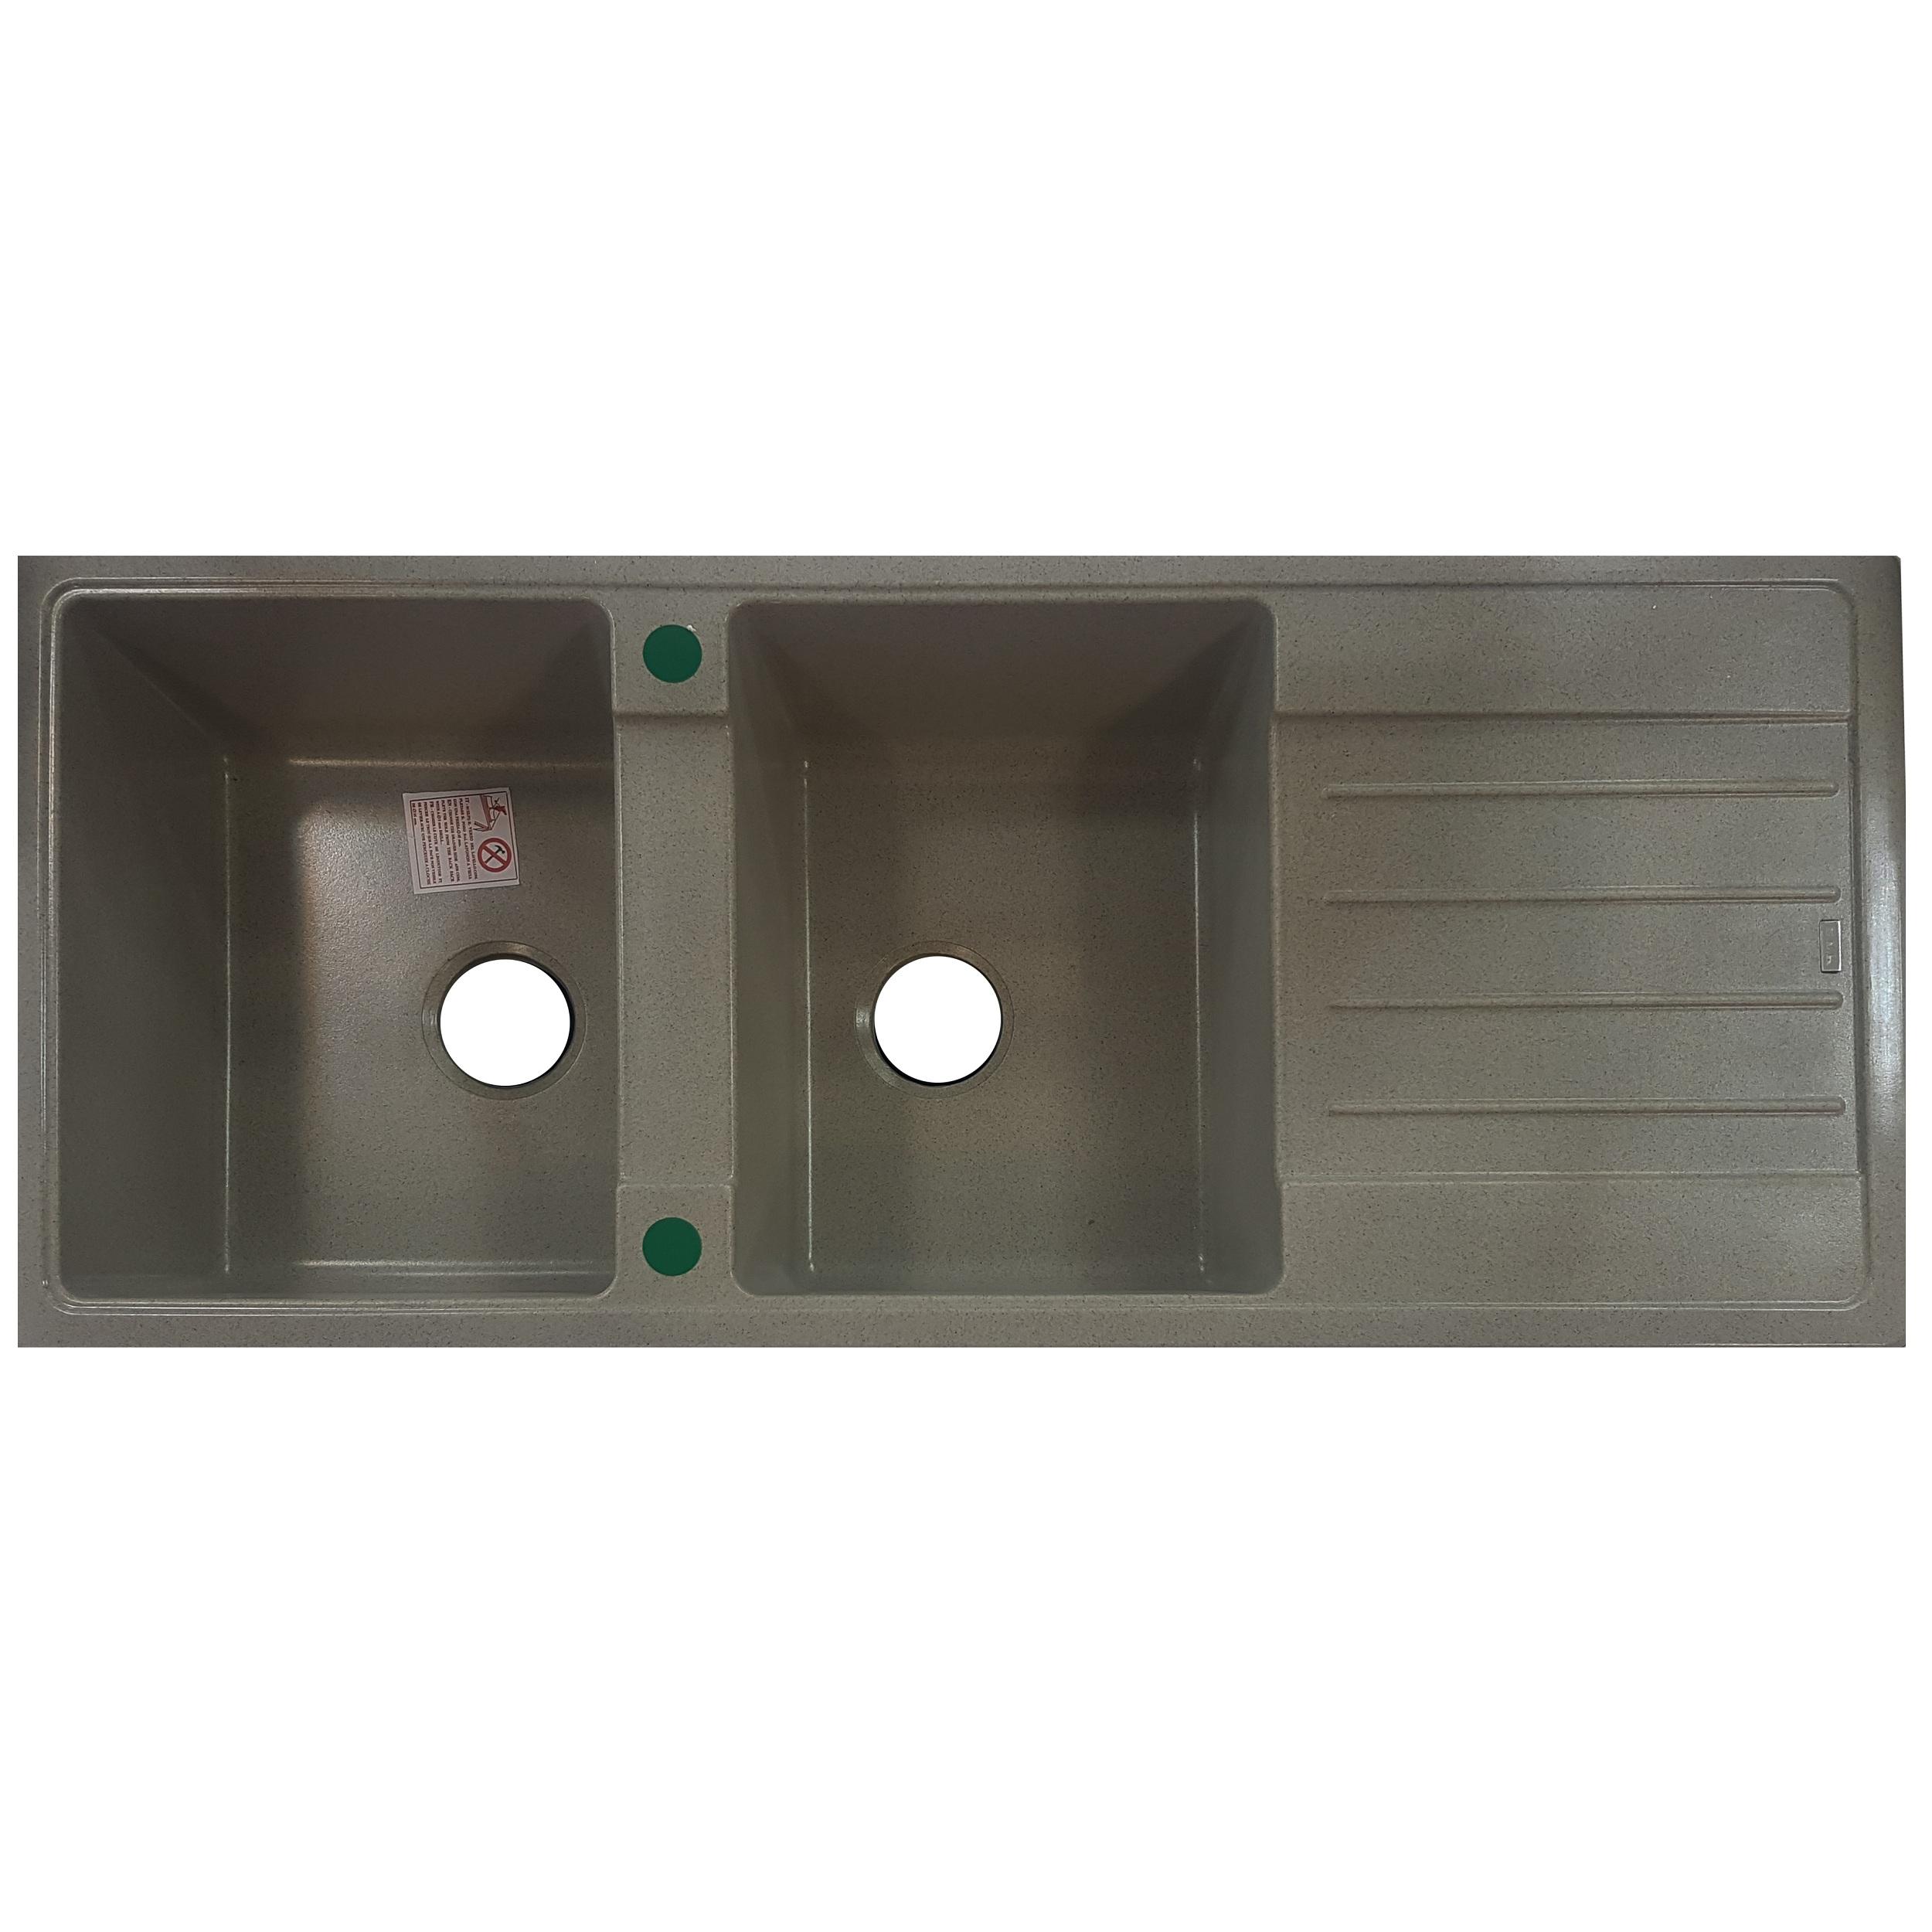 سینک ظرفشویی ای ال کی کد K102 توکار